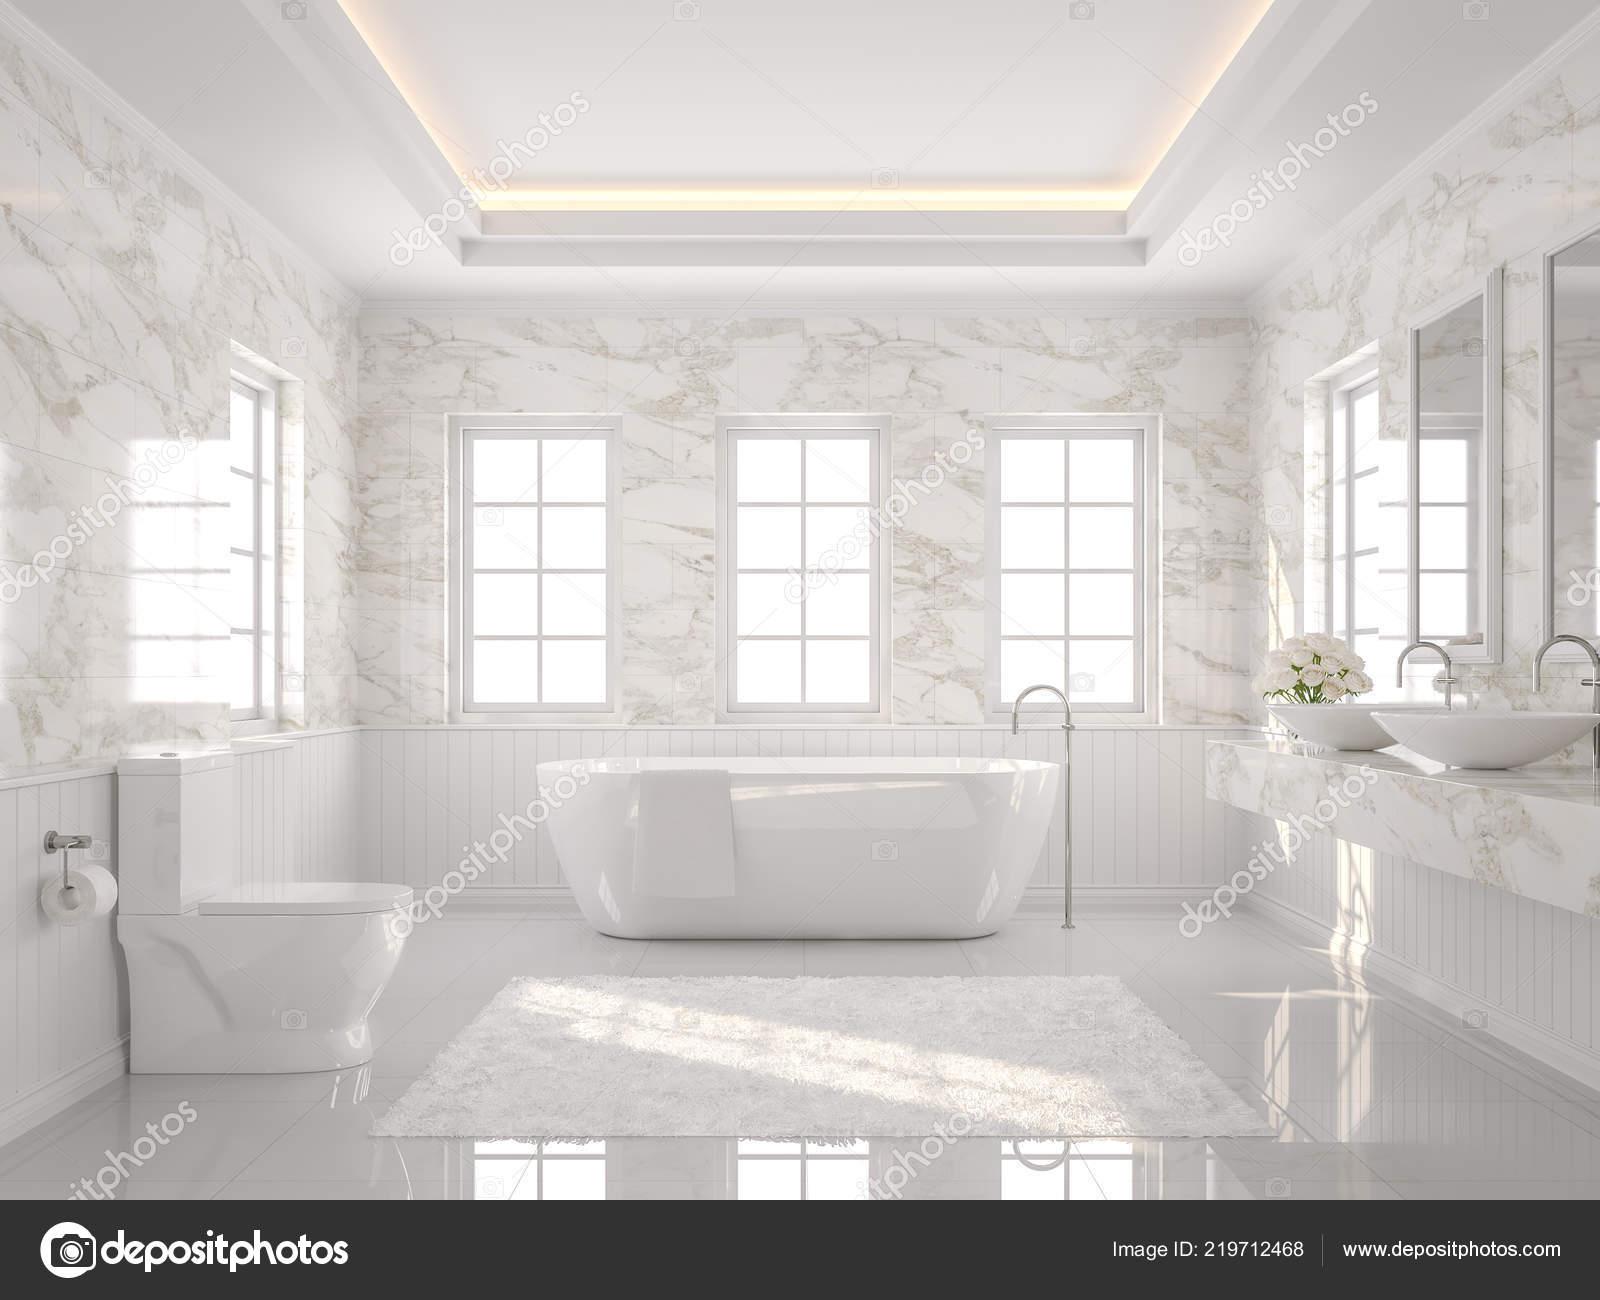 Rendu Luxe Blanc Salle Bain Carrelage Blanc Mur Marbre ...